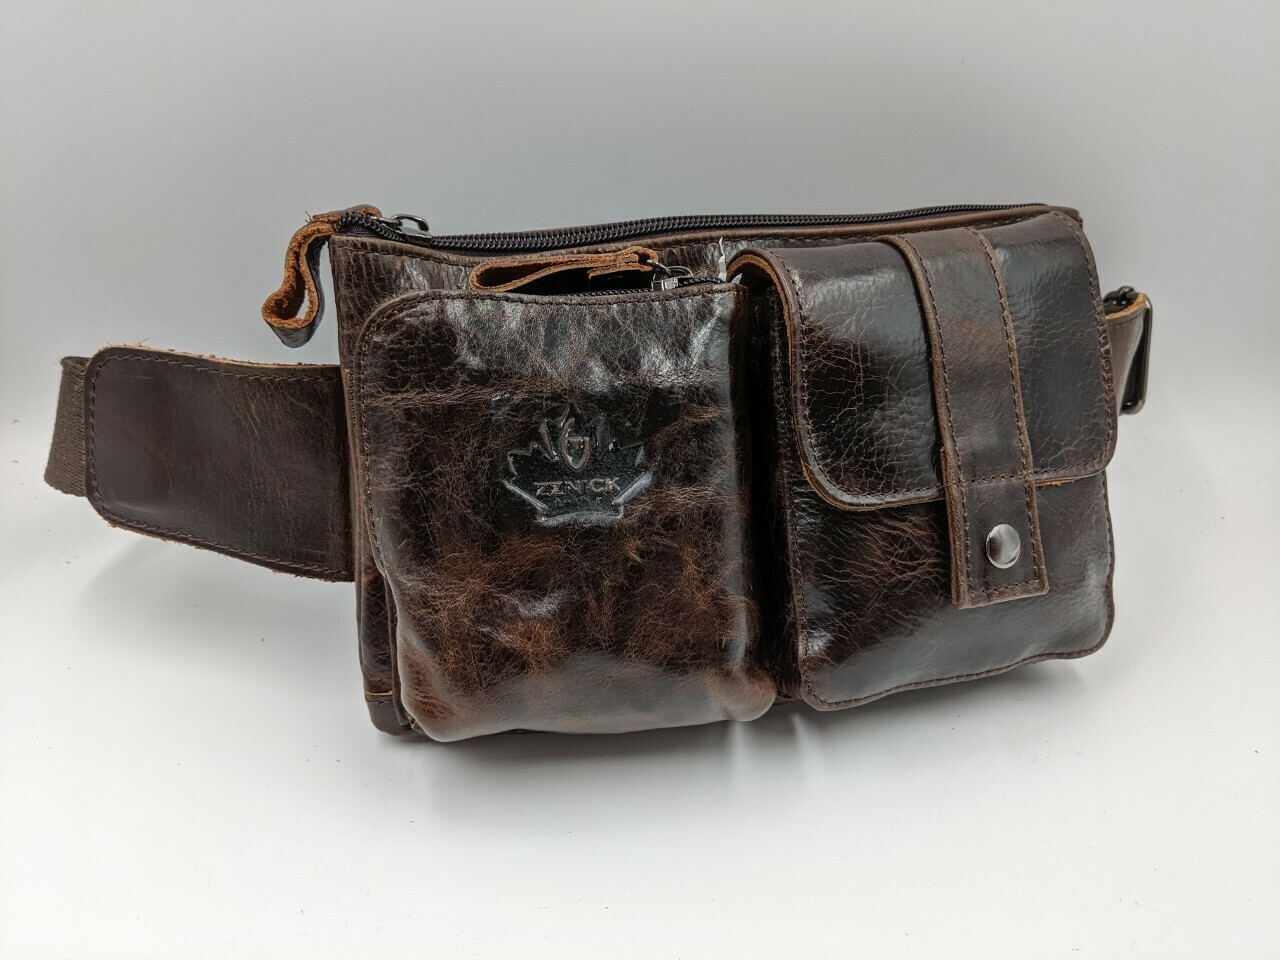 Мужская кожаная сумка zznick 7713